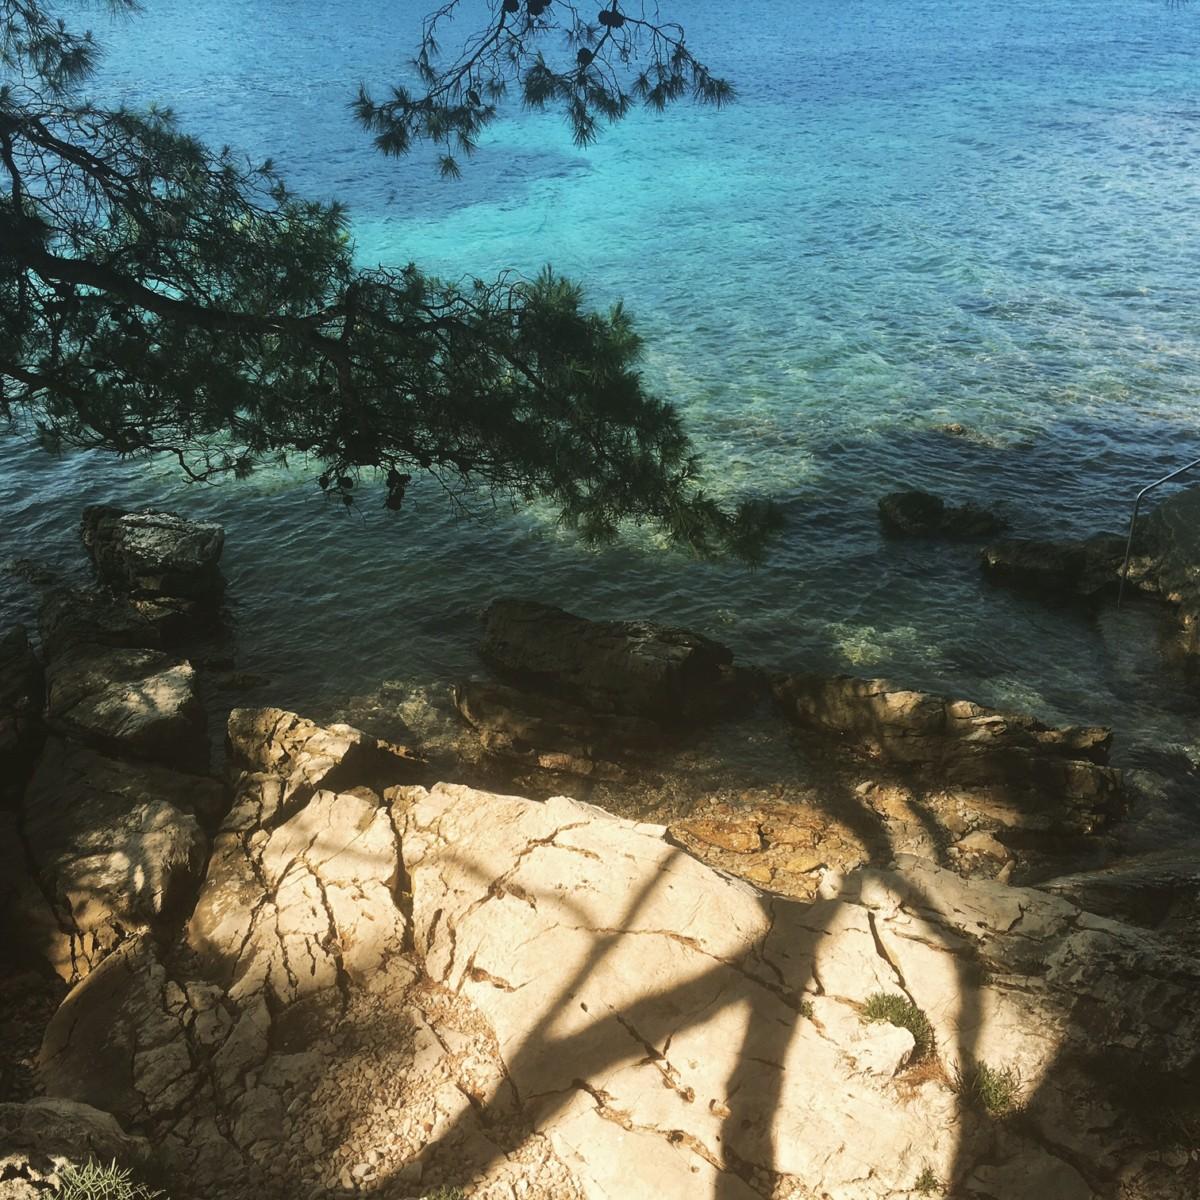 Stari Grad on the island of Hvar, Croatia with Seen by Solomon travel blog